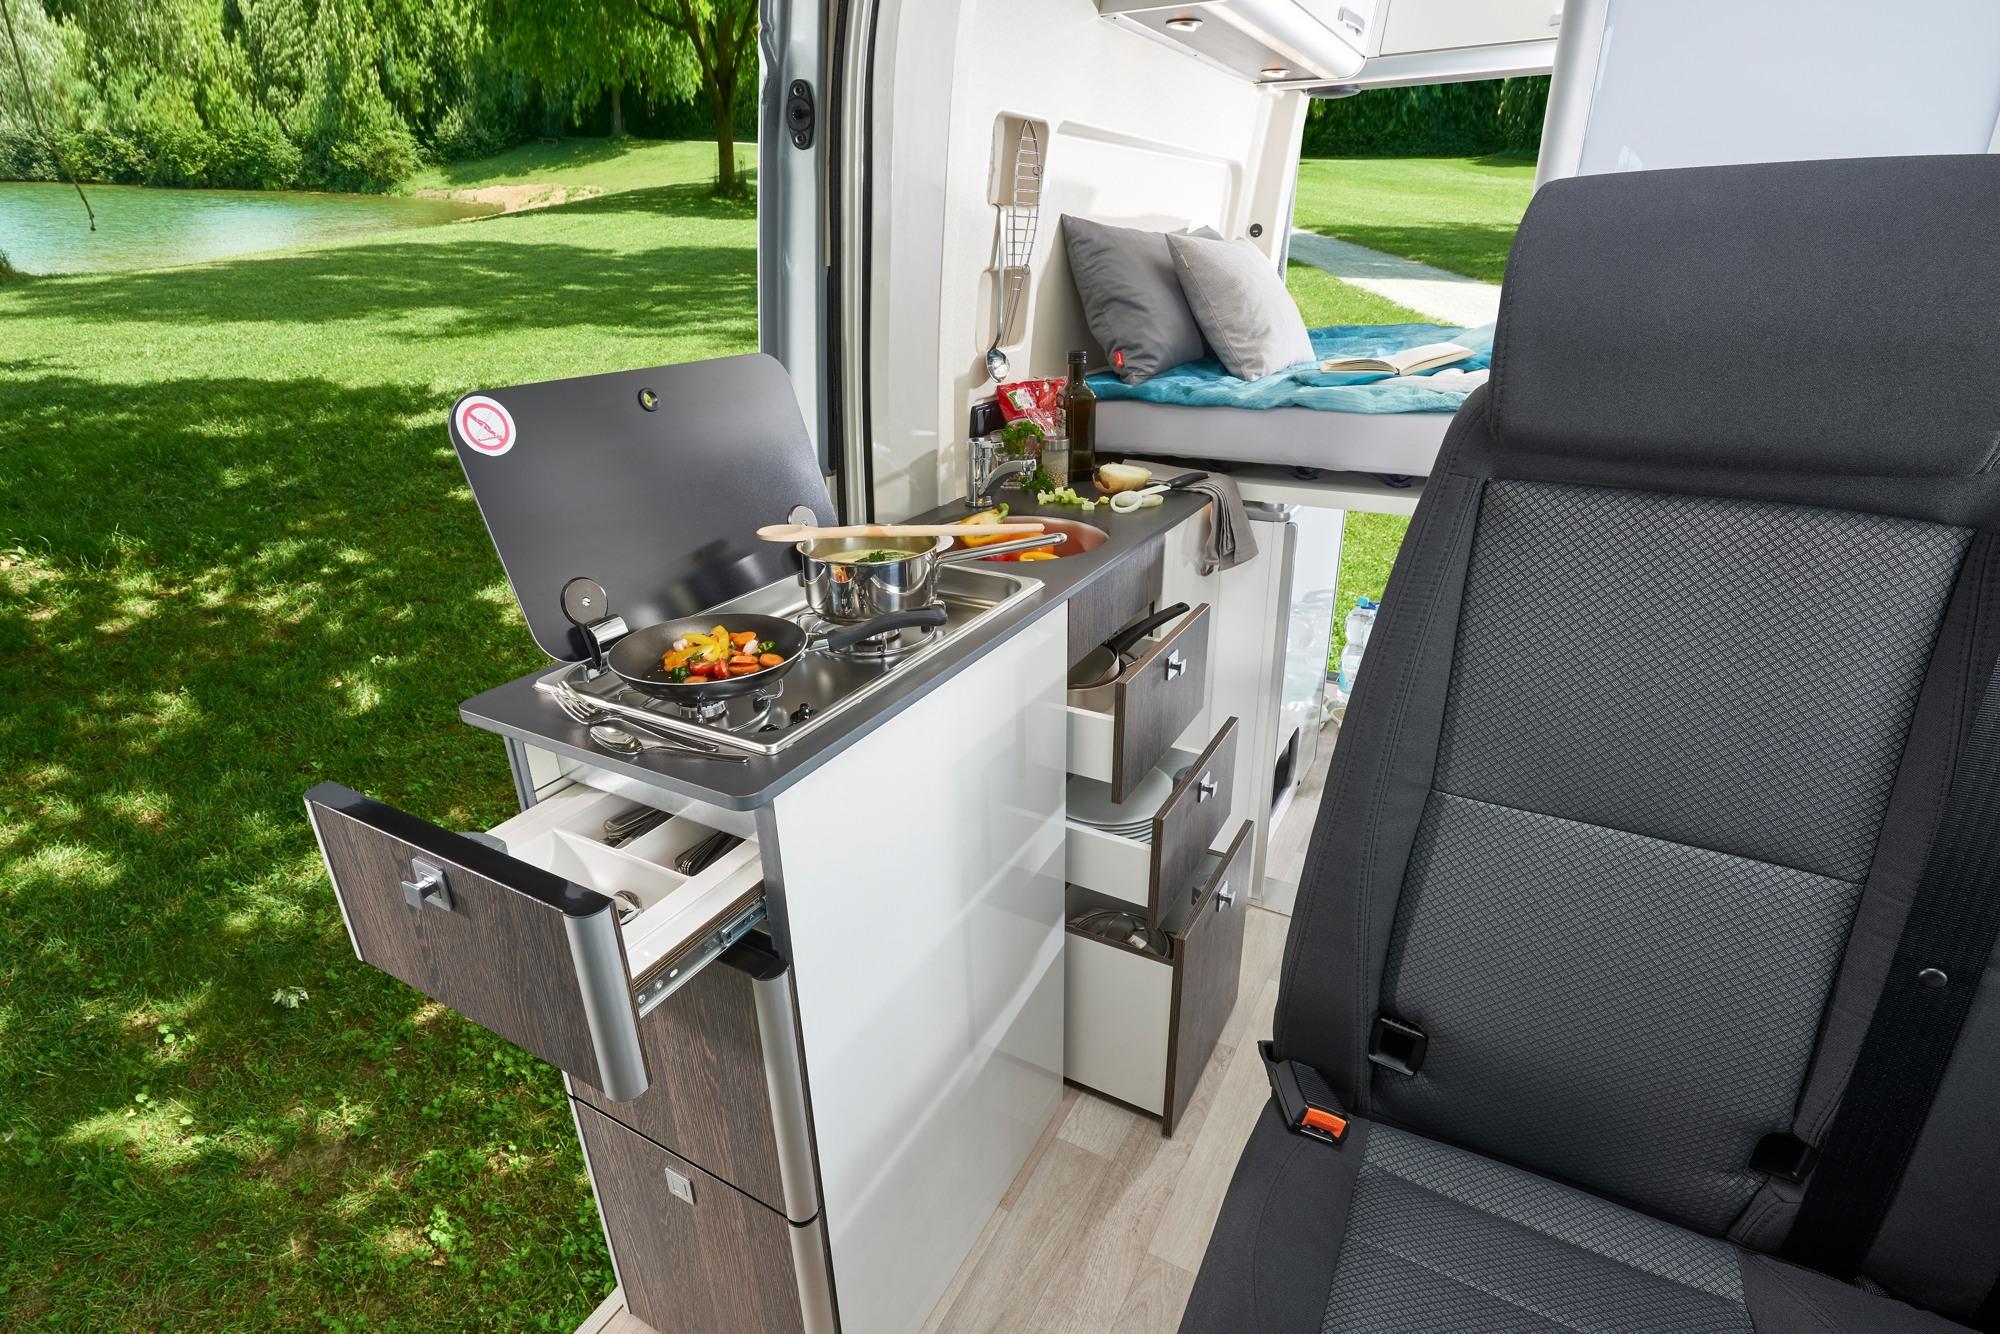 sven hedin im profitest westfalia mobil gmbh. Black Bedroom Furniture Sets. Home Design Ideas